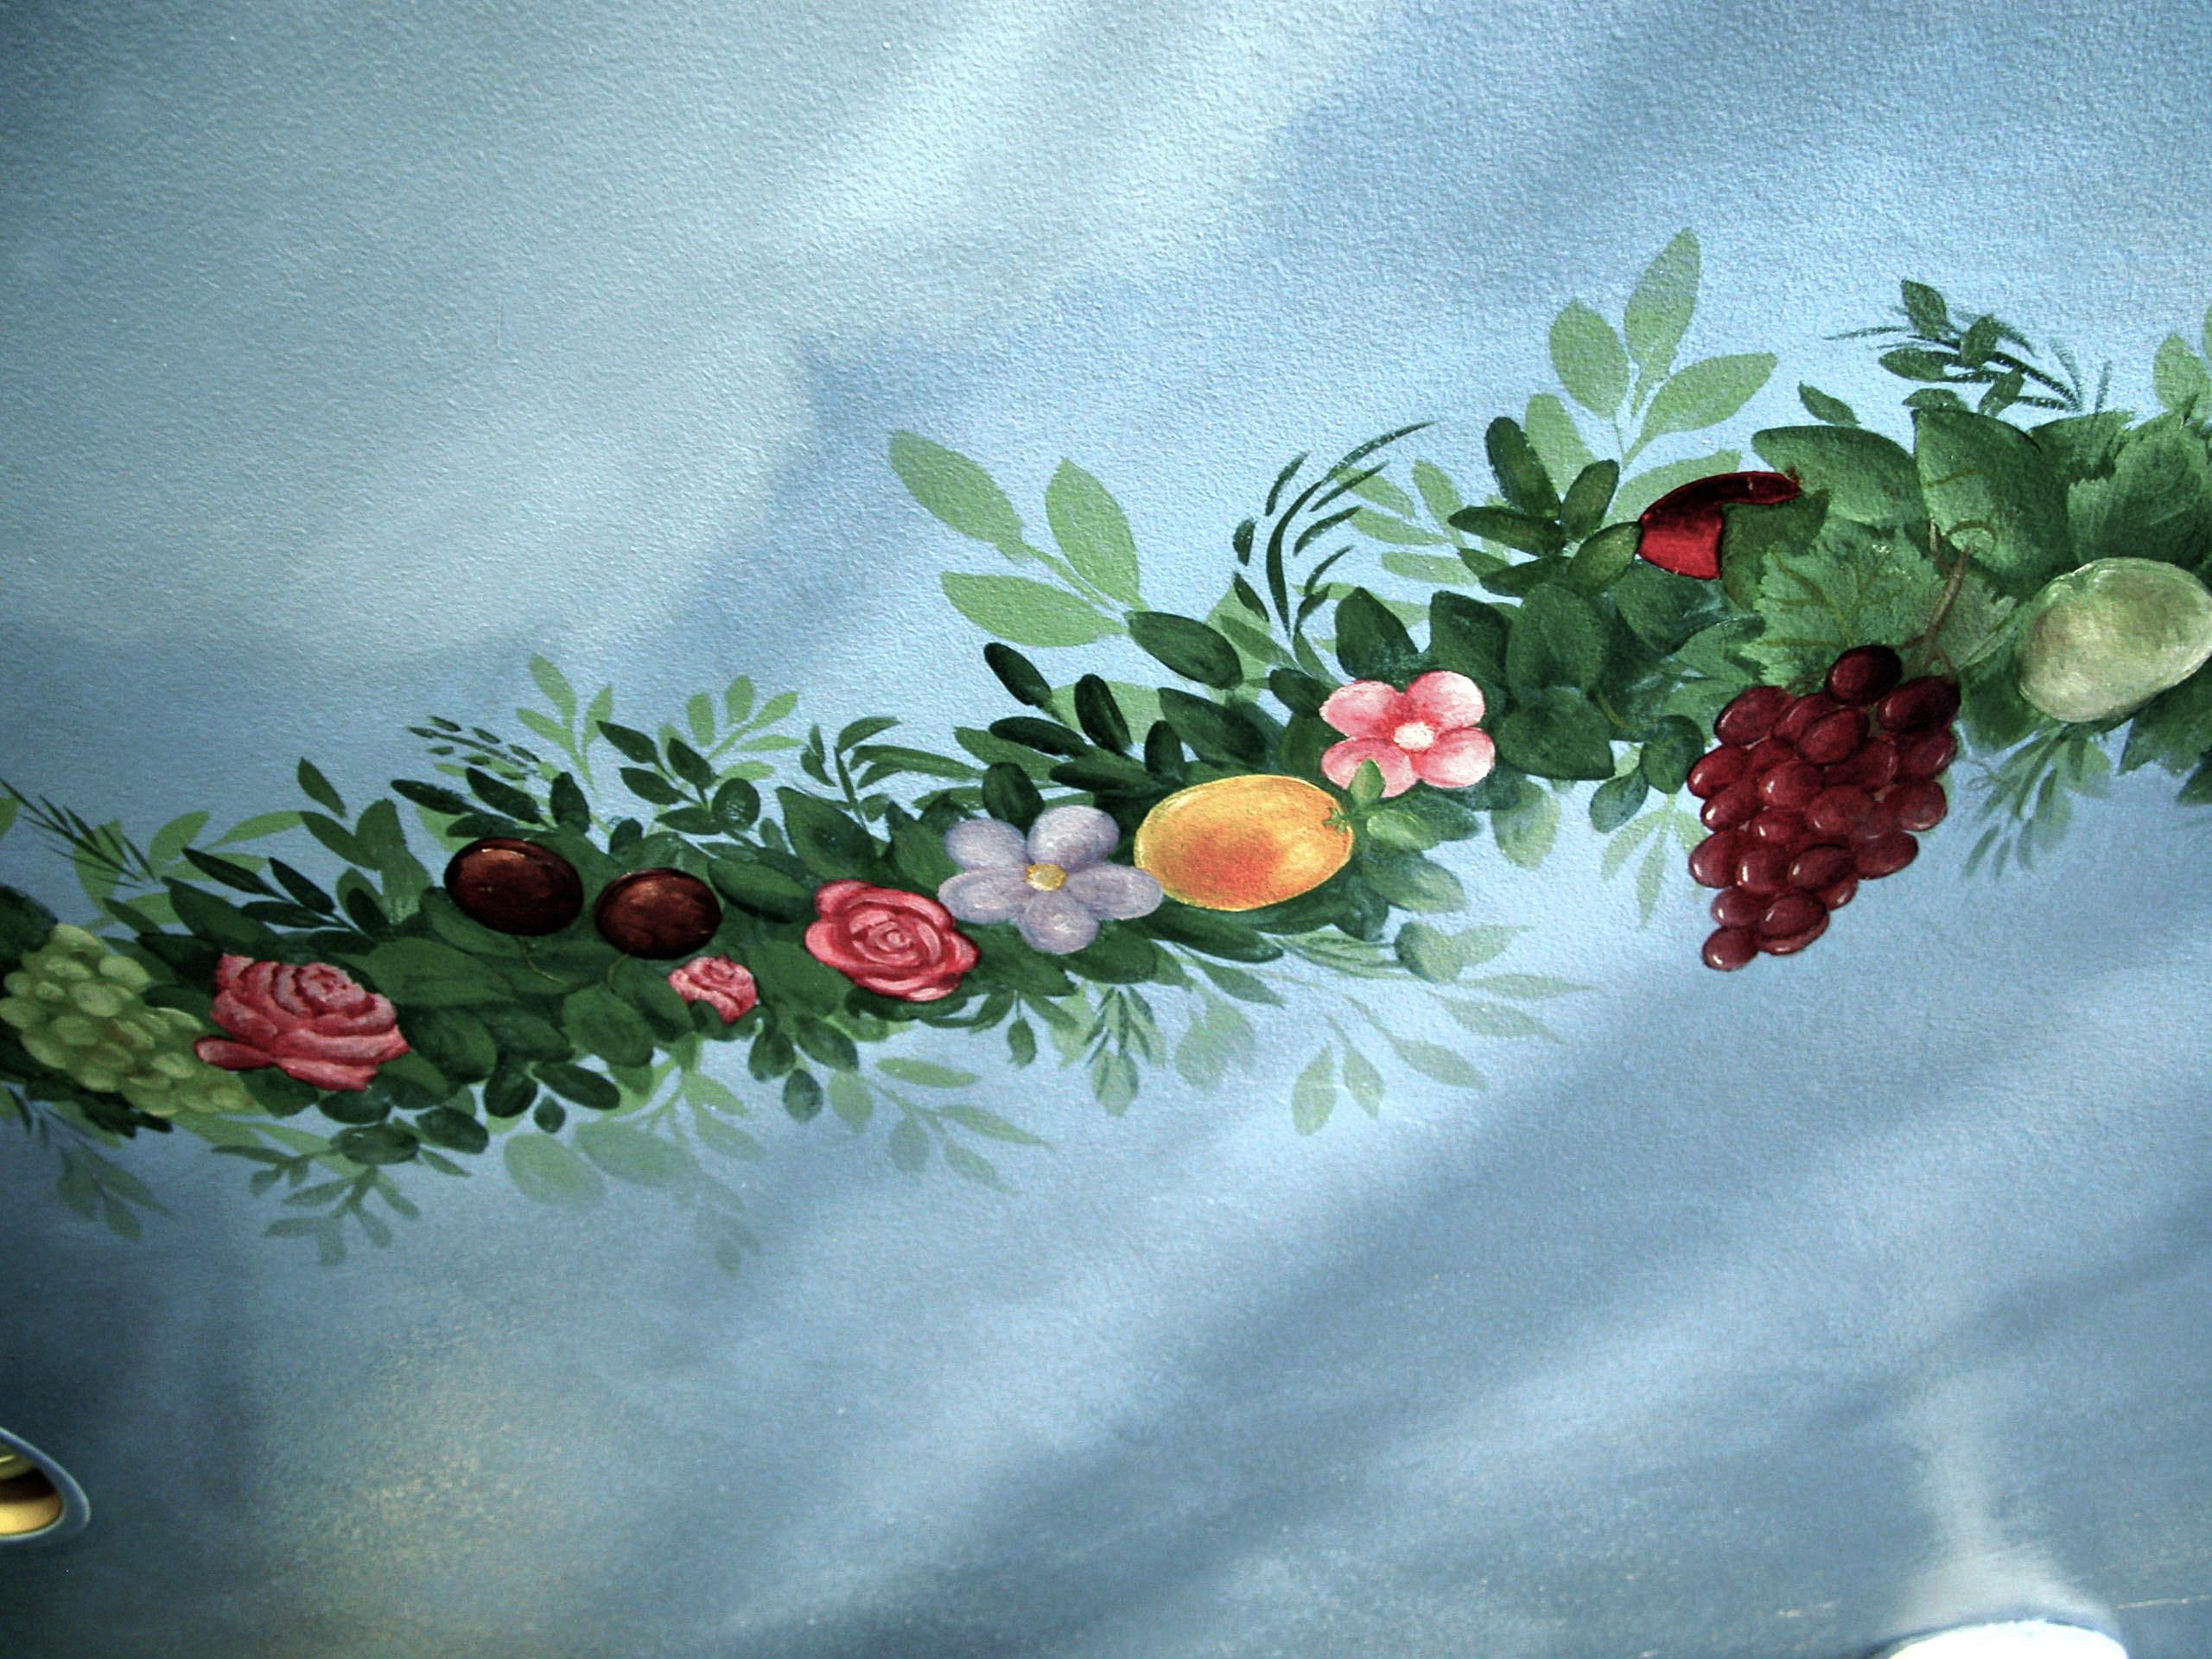 Mural Ceiling Idea Millnurn Nj